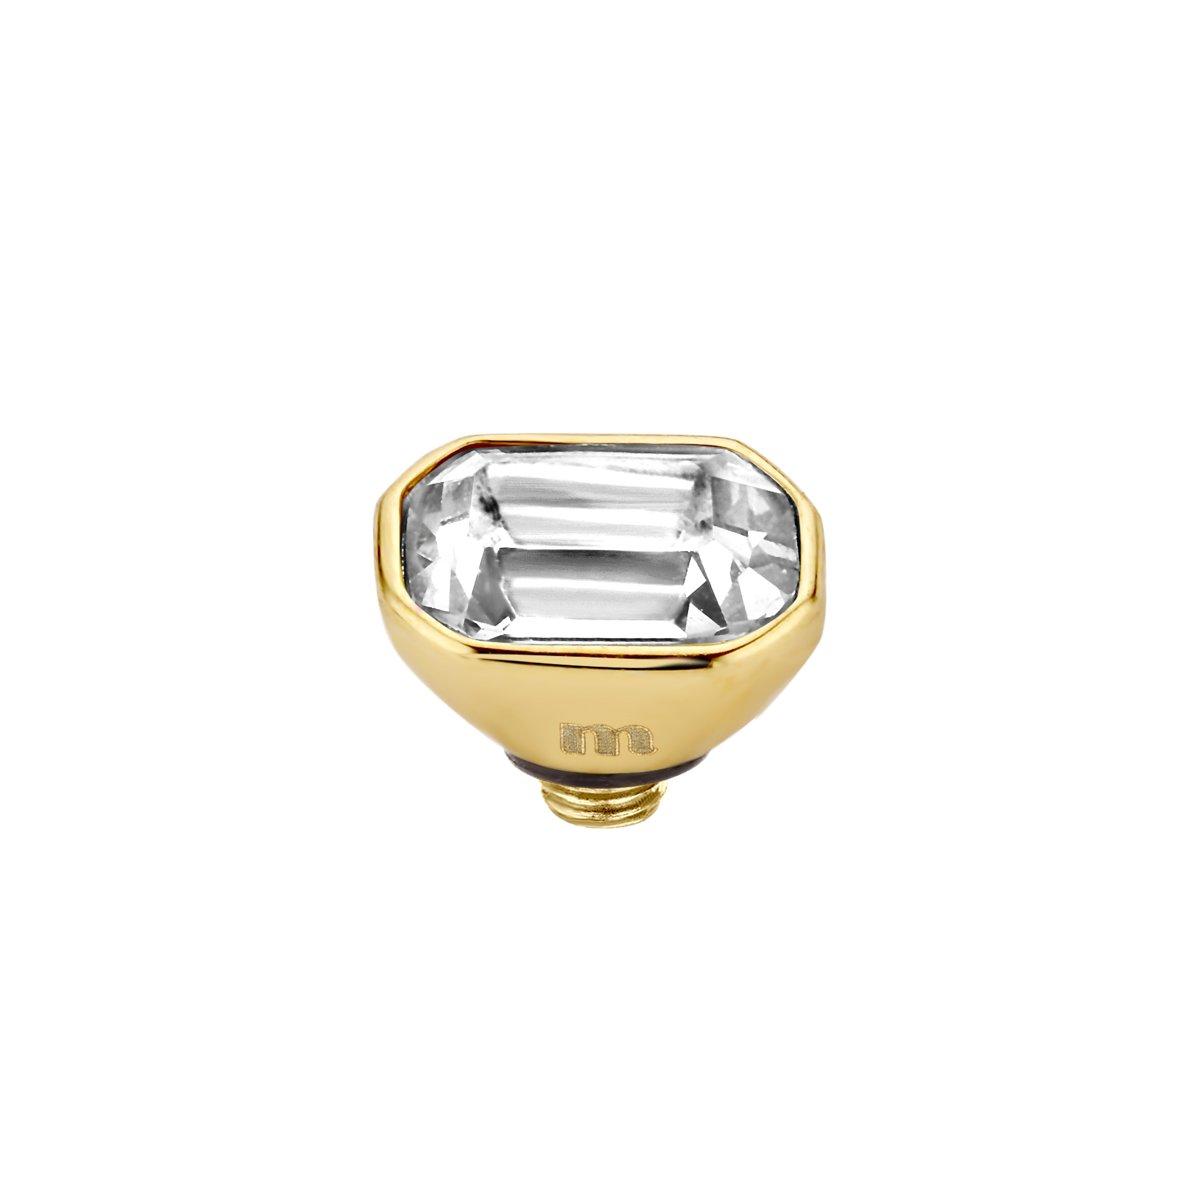 Melano twisted pillow cz steentje - crystal - dames - goudkleurig - 4mm kopen